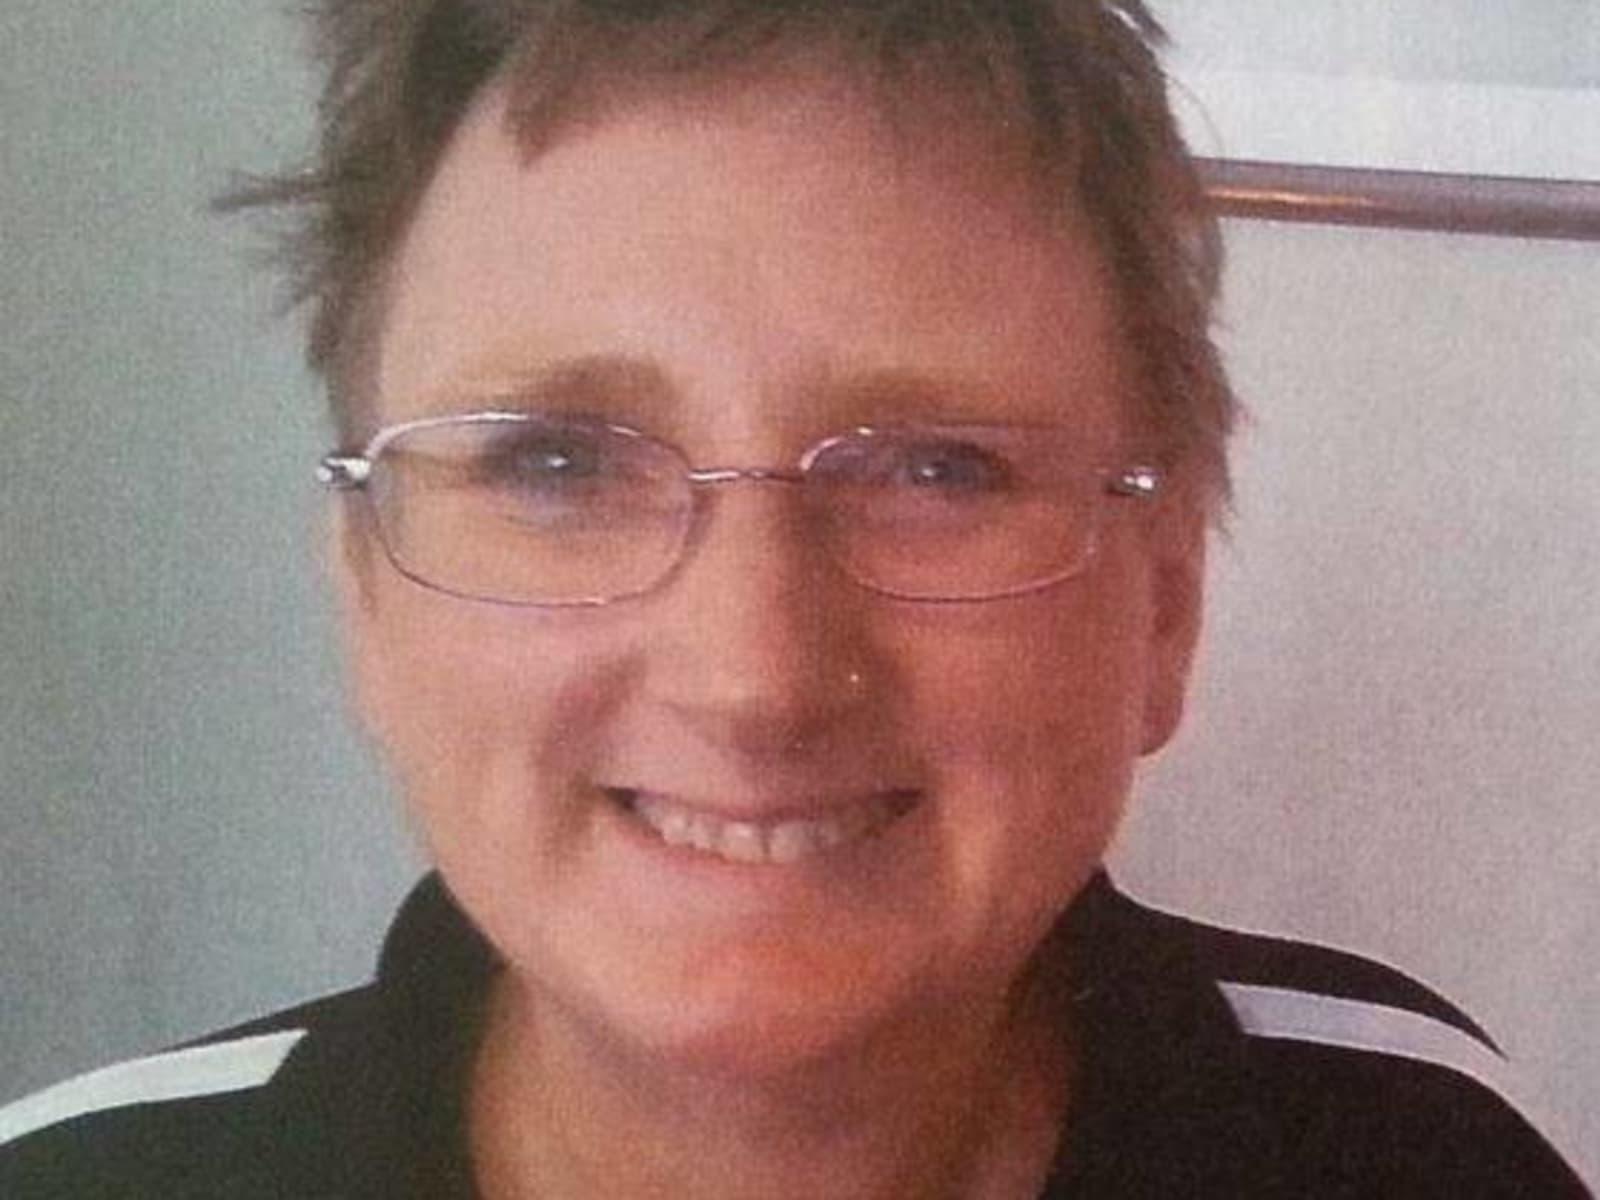 Lisa from Wellington, New Zealand